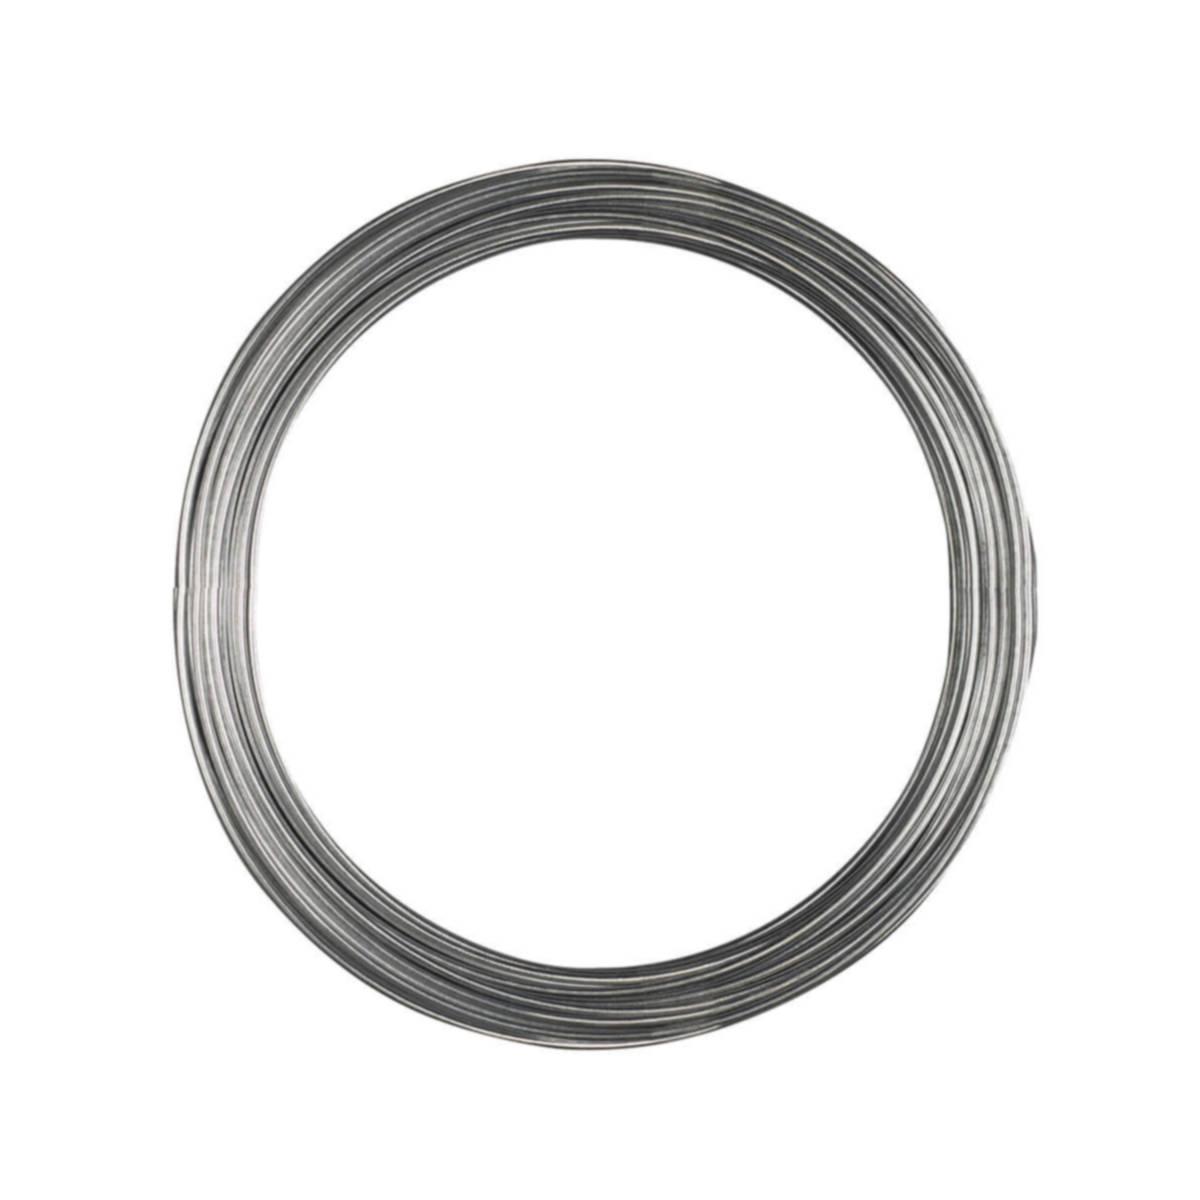 Ben-Mor Cables 93006